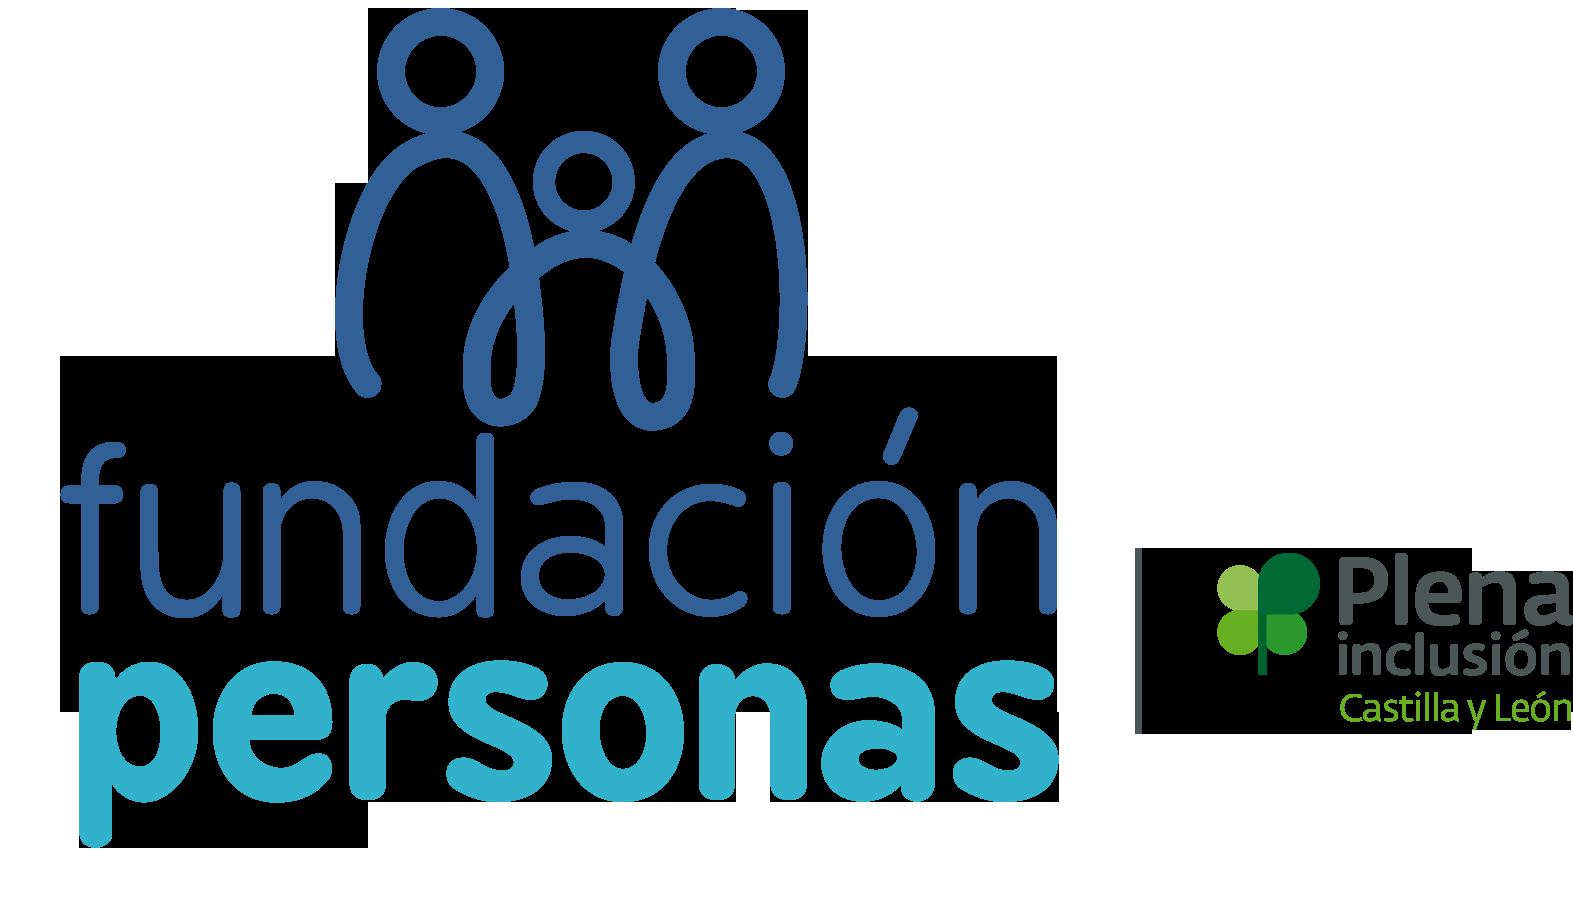 Fundacion Personas